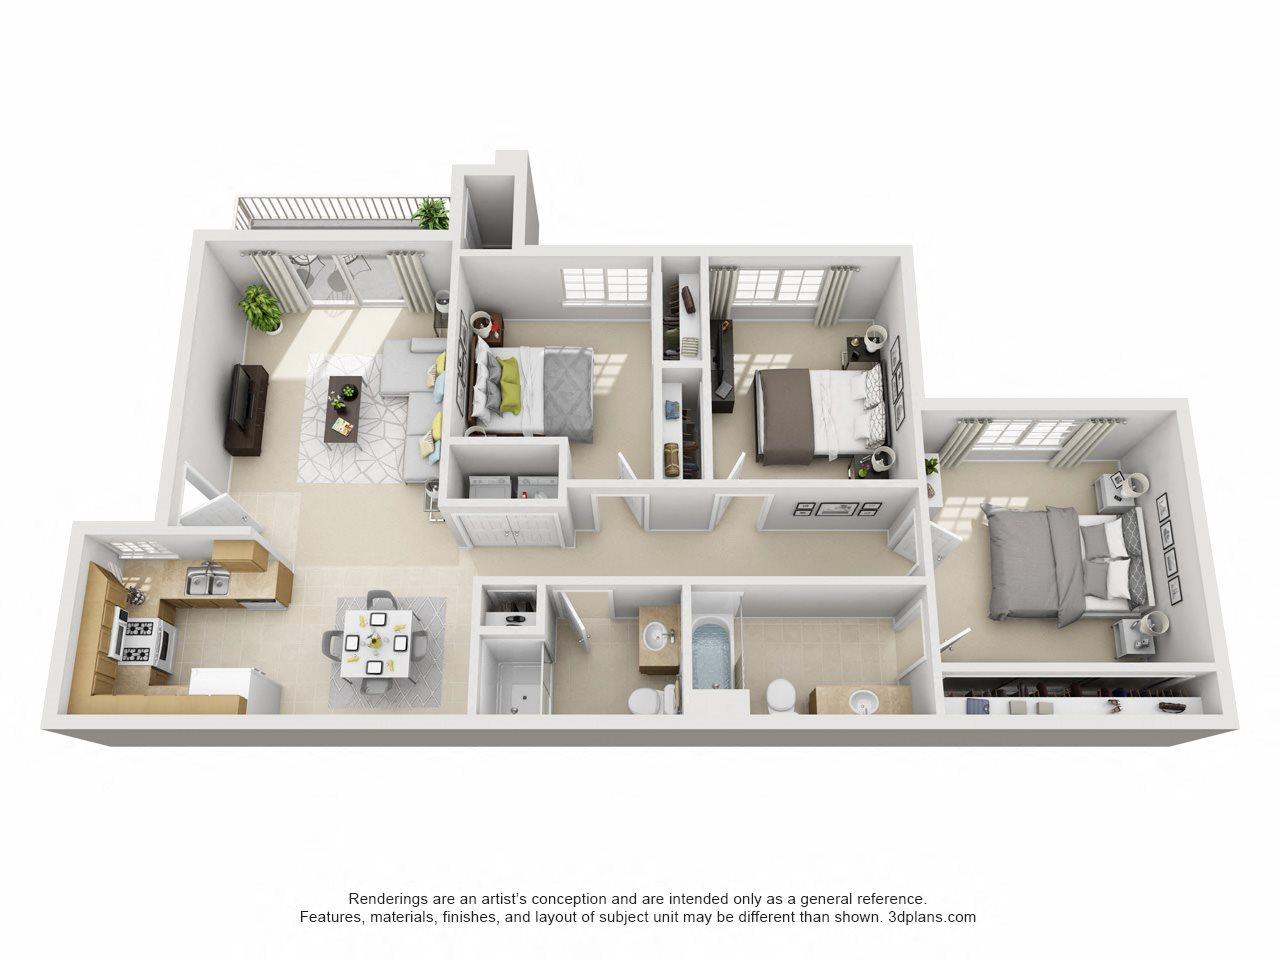 3 Bedroom, 2 Bath Upstairs Floor Plan 8